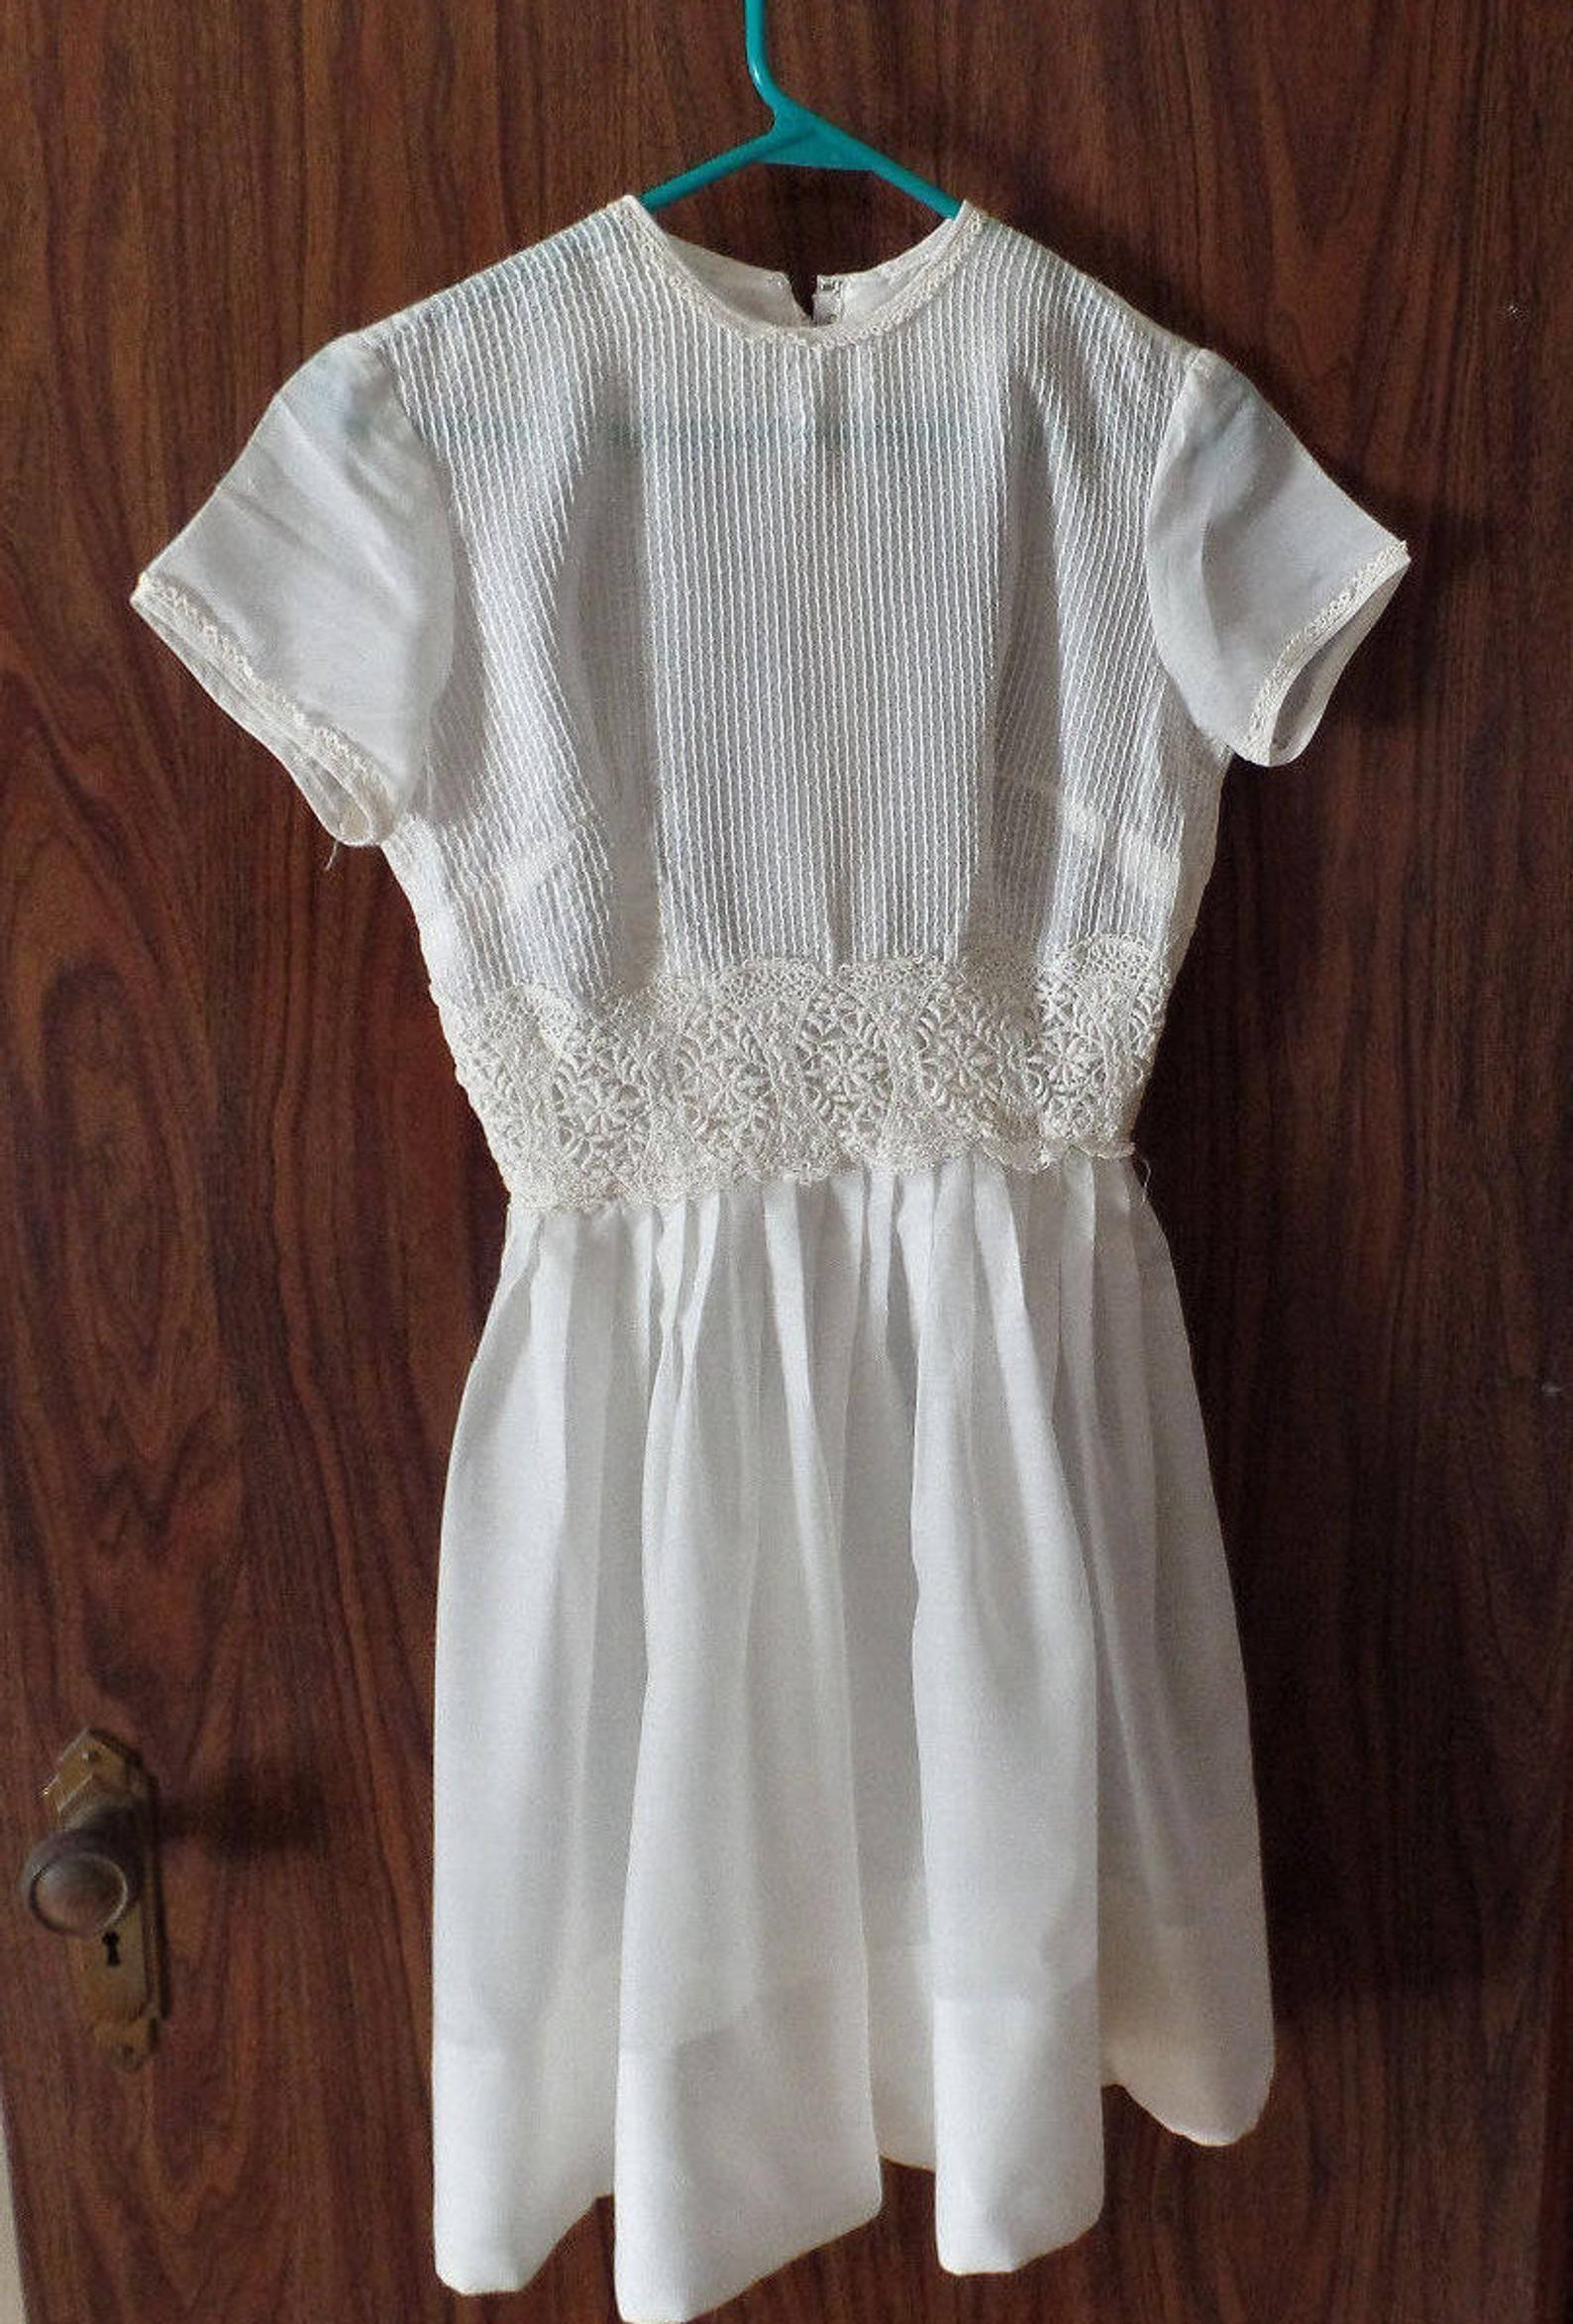 First Communion Dress With Matching Slip Little Duchess Slip Girls White Dress Confirmation Dress Con In 2020 Girls White Dress Confirmation Dresses Church Dresses